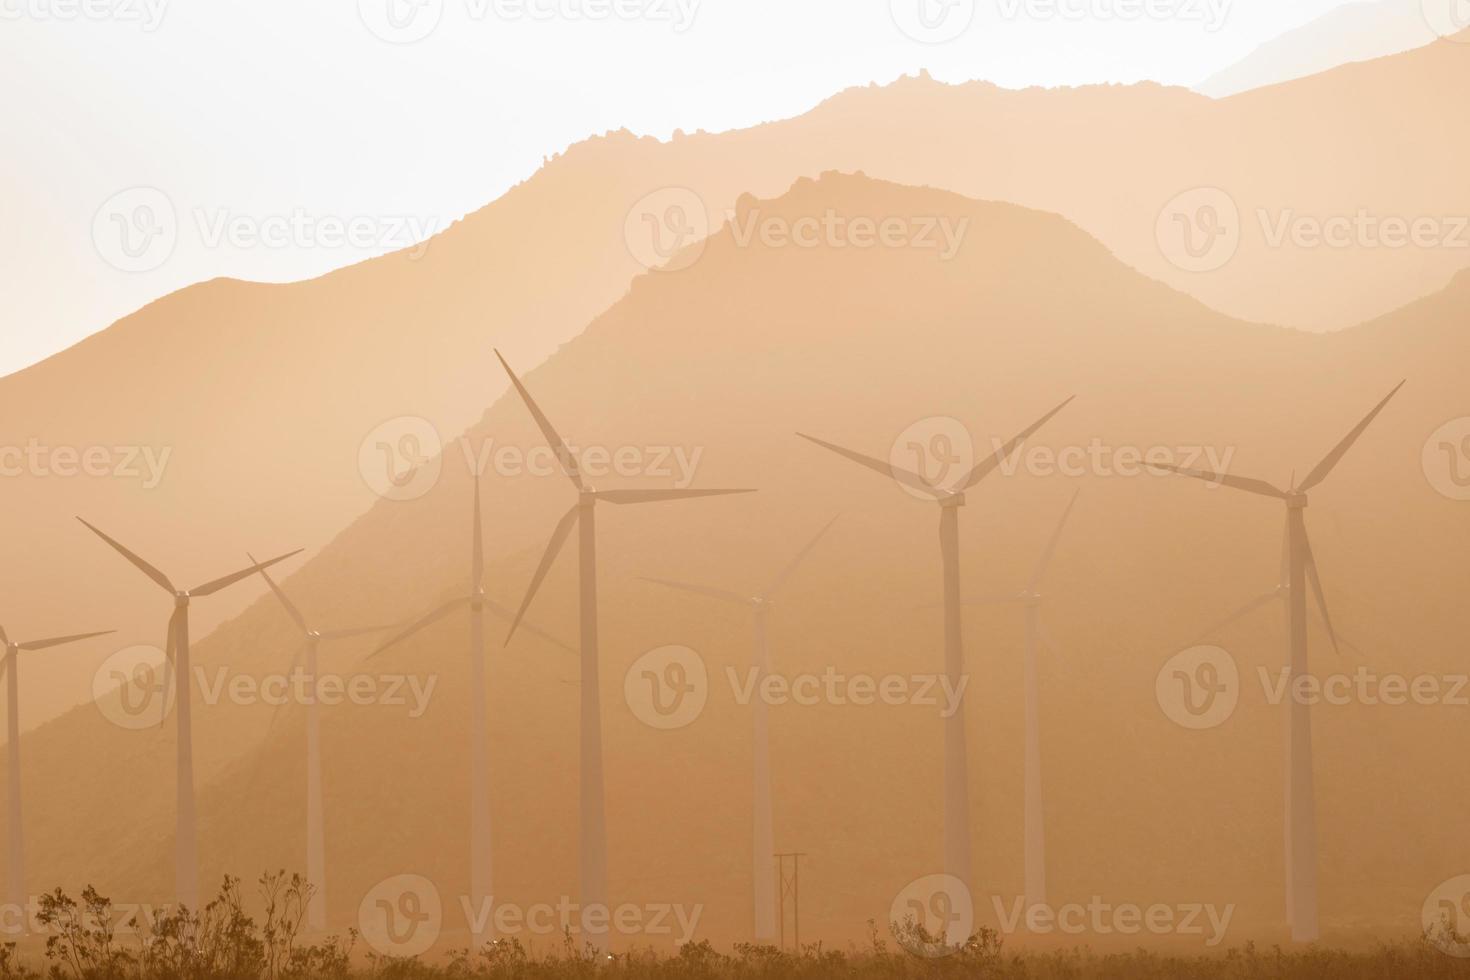 energia ecologica alternativa per turbine eoliche a energia verde pulita foto